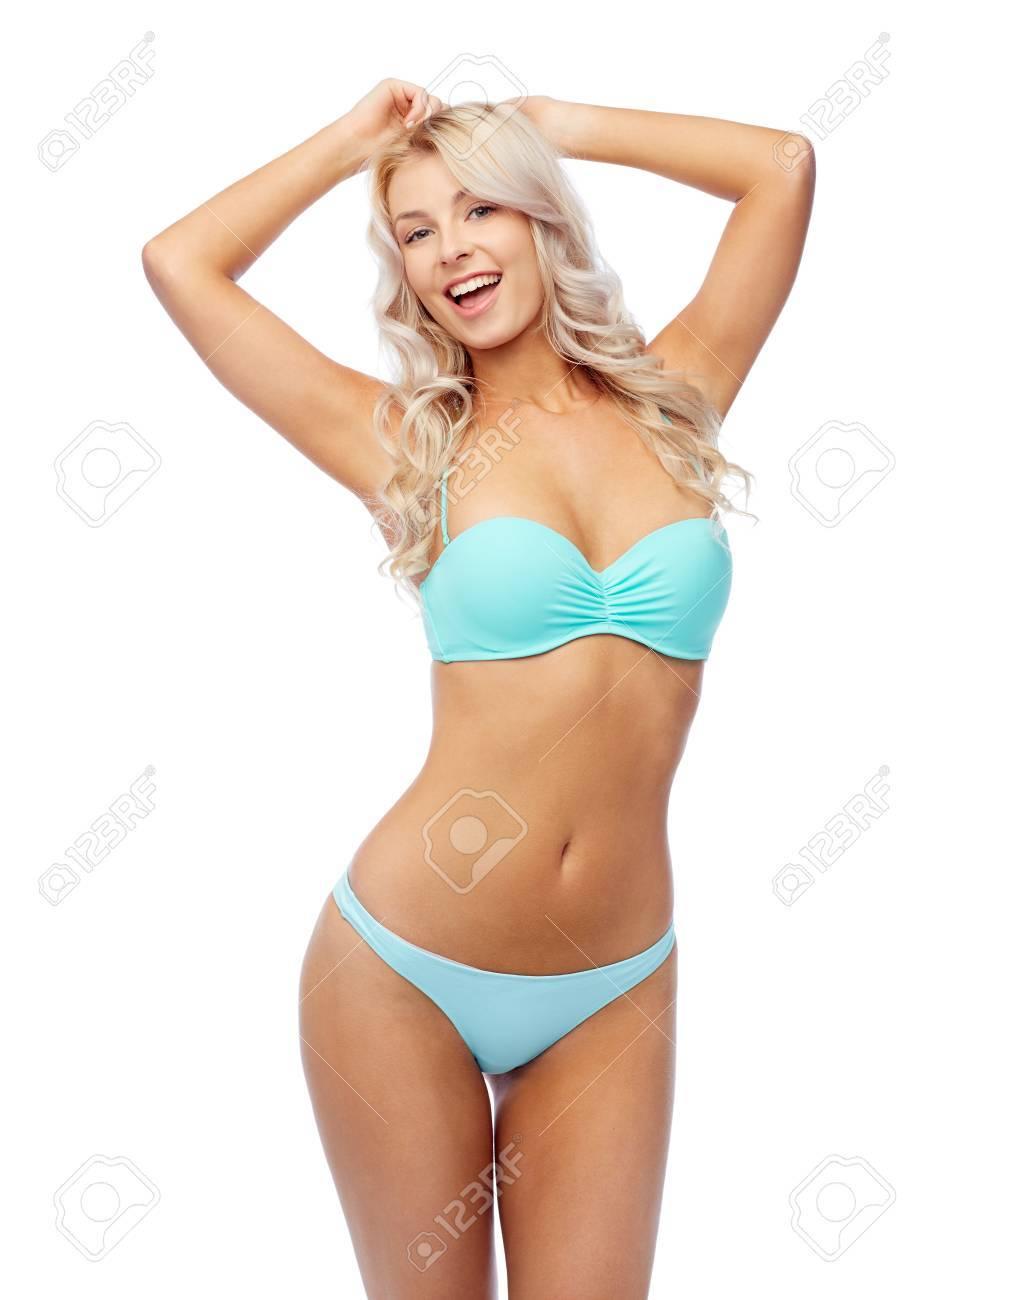 da3a757fe4f9 Feliz mujer joven sonriente en traje de baño de bikini